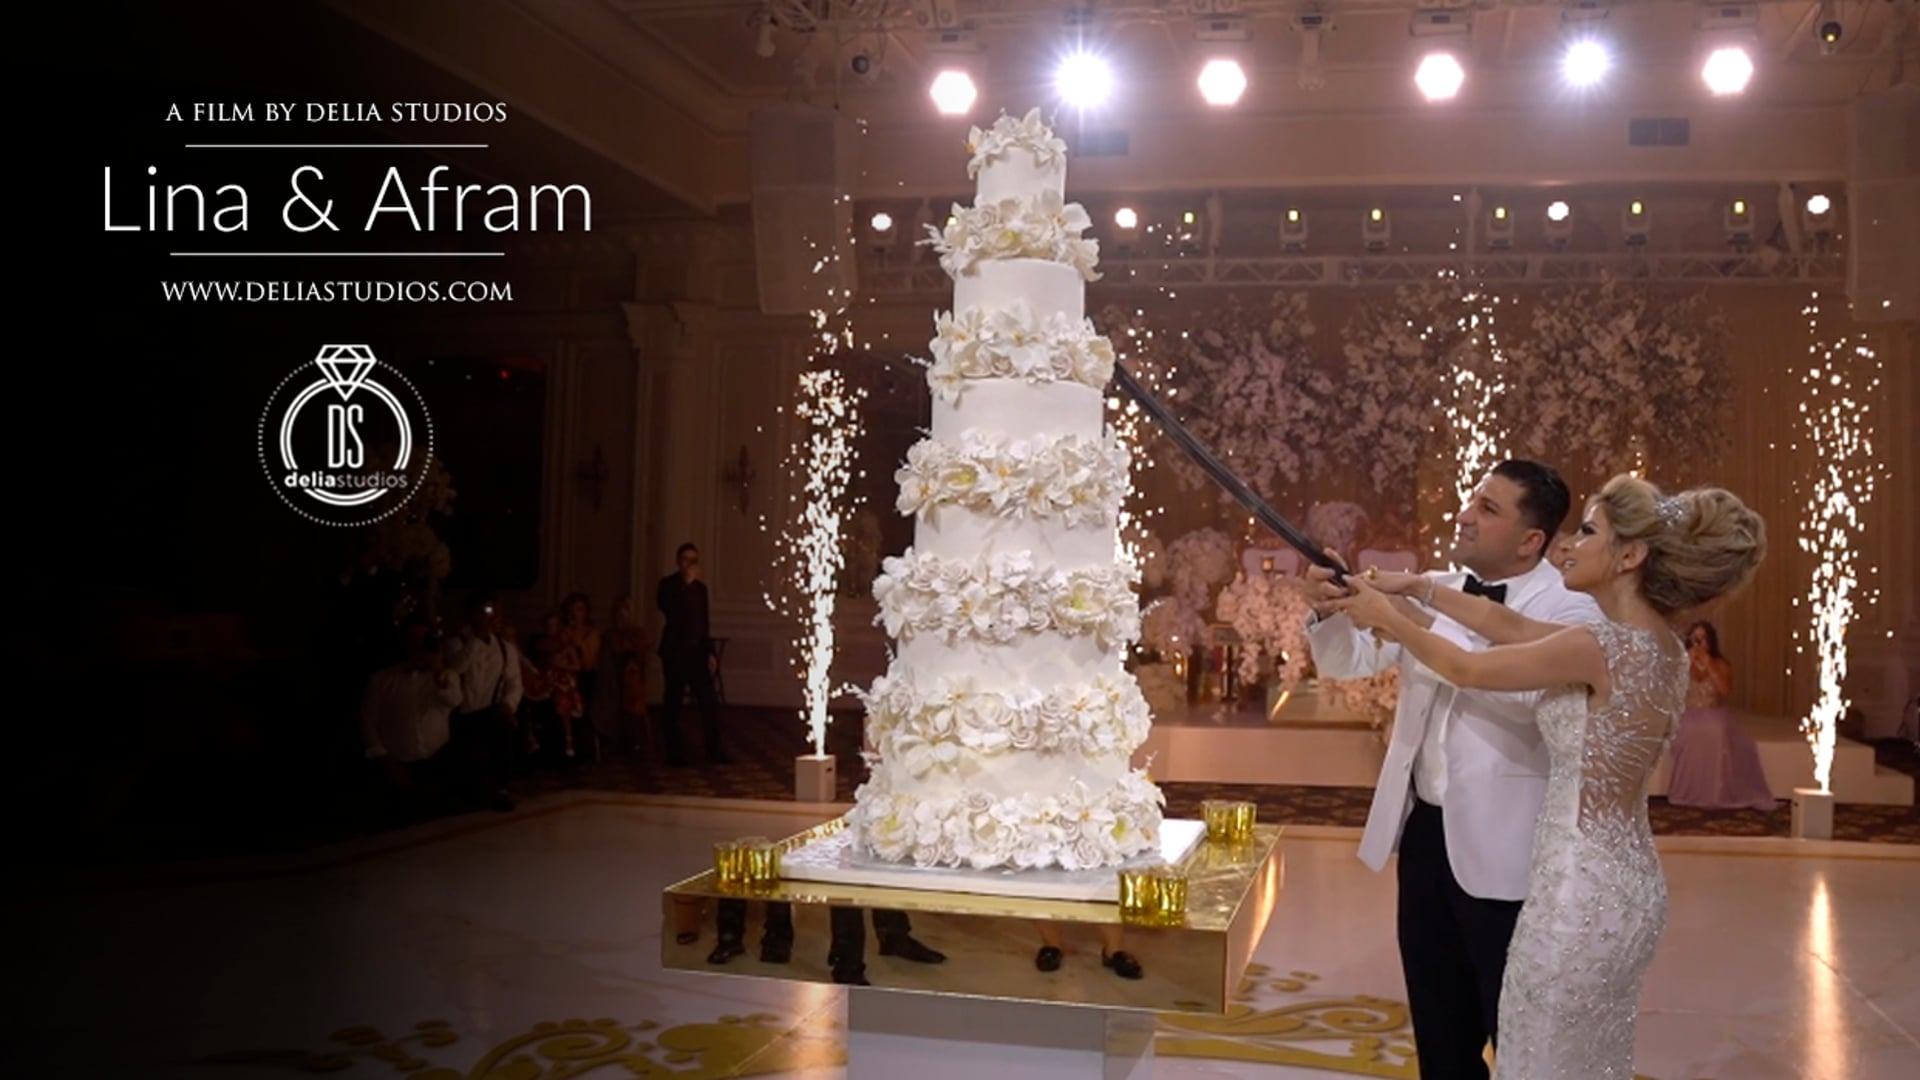 Lina & Afram :: Wedding Highlights :: The Legacy Castle, Pompton Plains, NJ